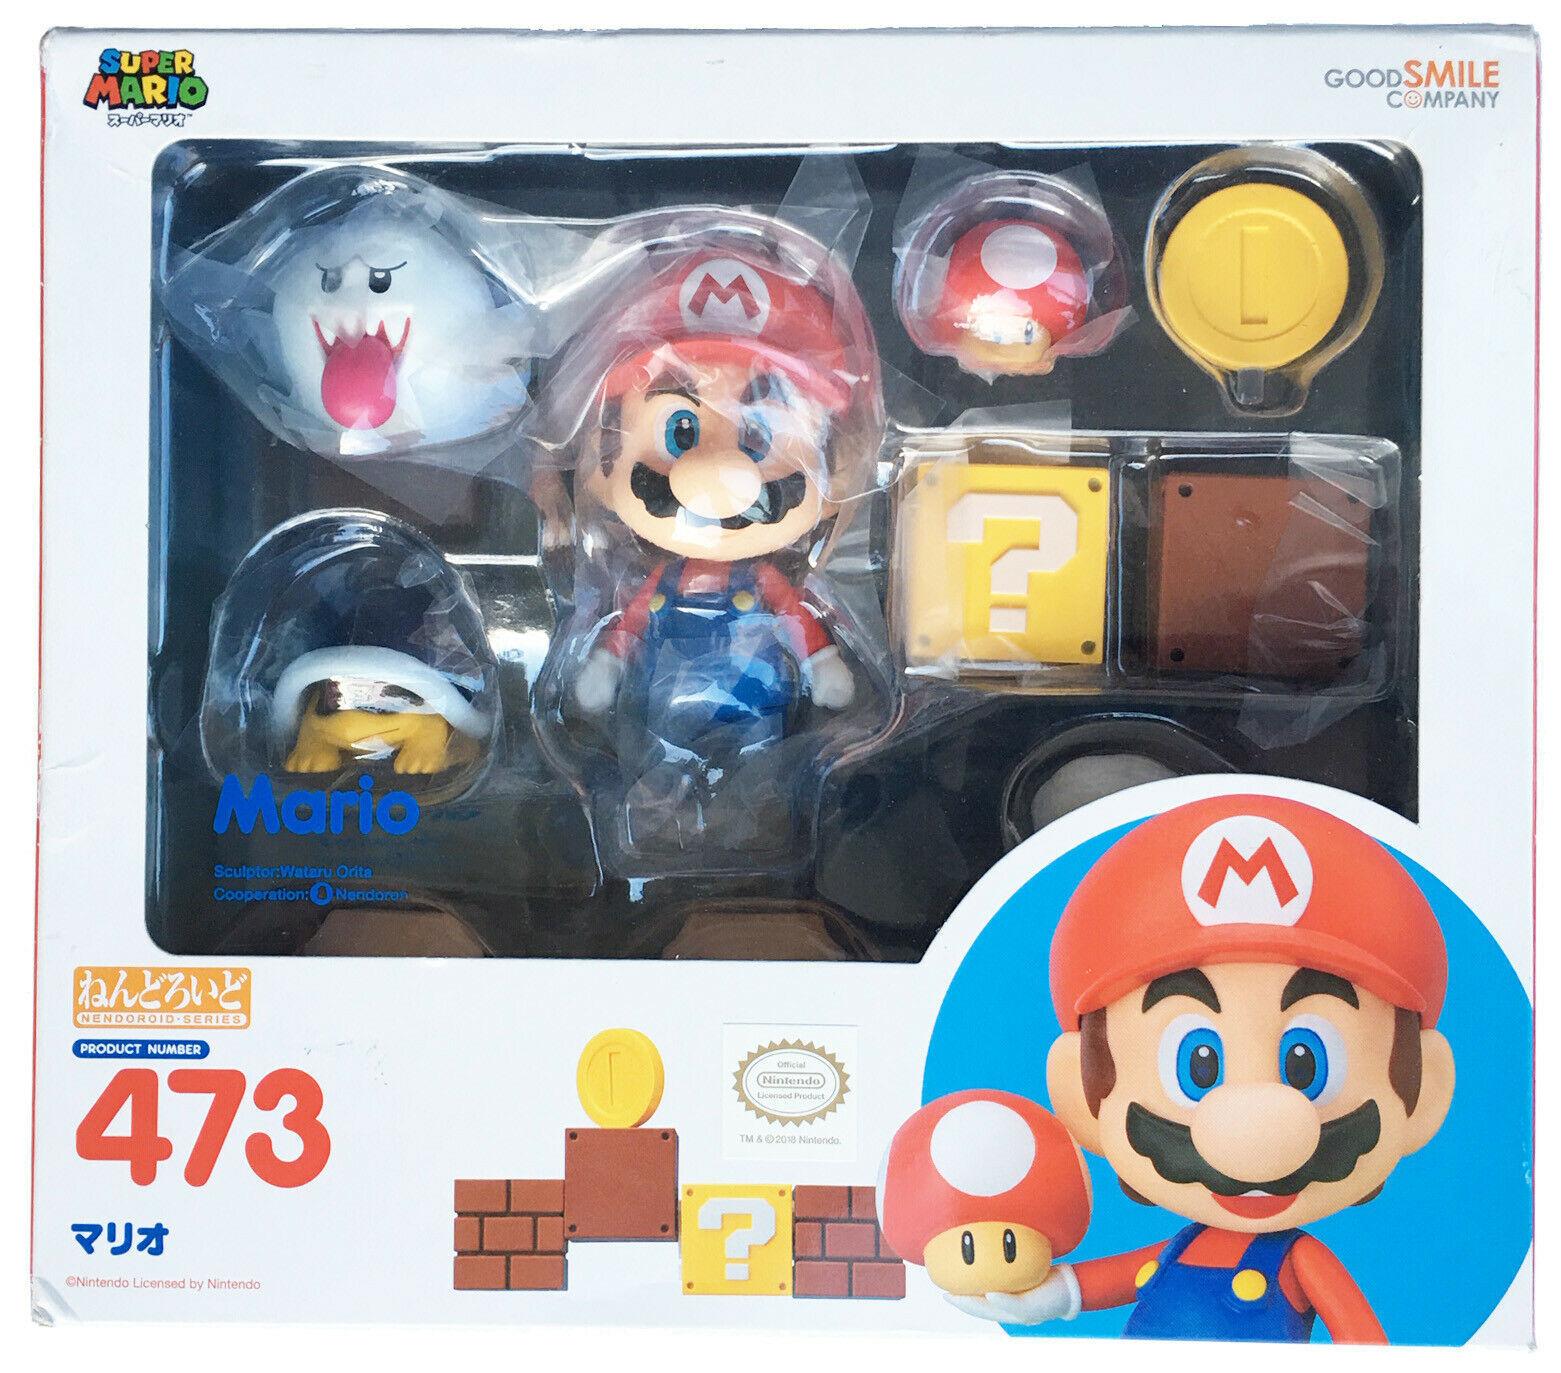 Super Mario 6 Inch Classic Skin Action Figure Nendoroid Series 473 Good Smile Co